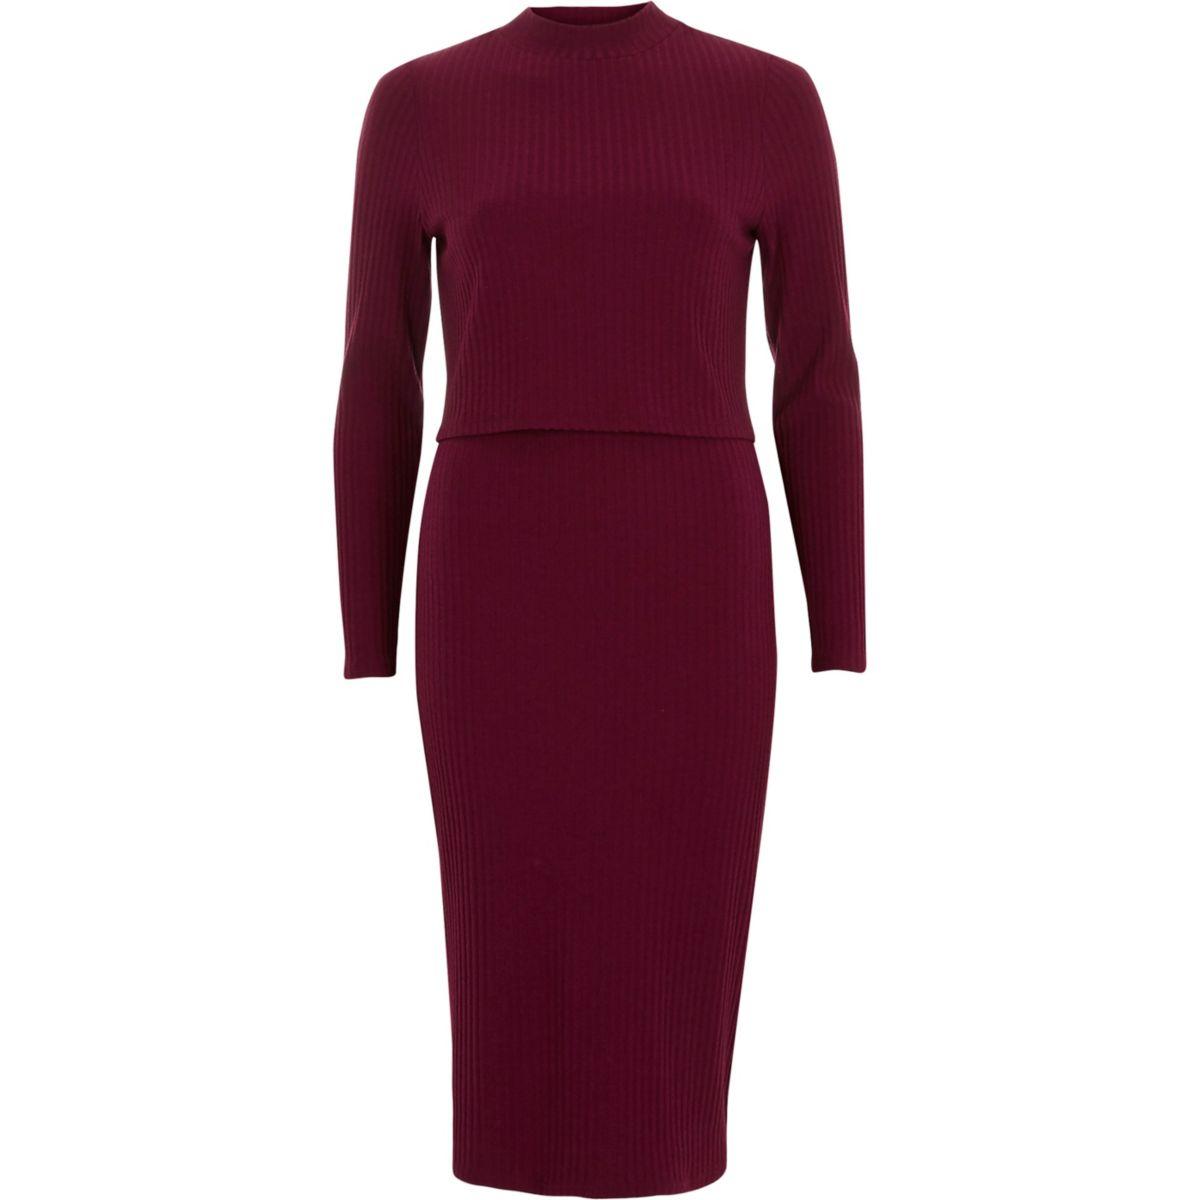 Burgundy rib double layer bodycon midi dress